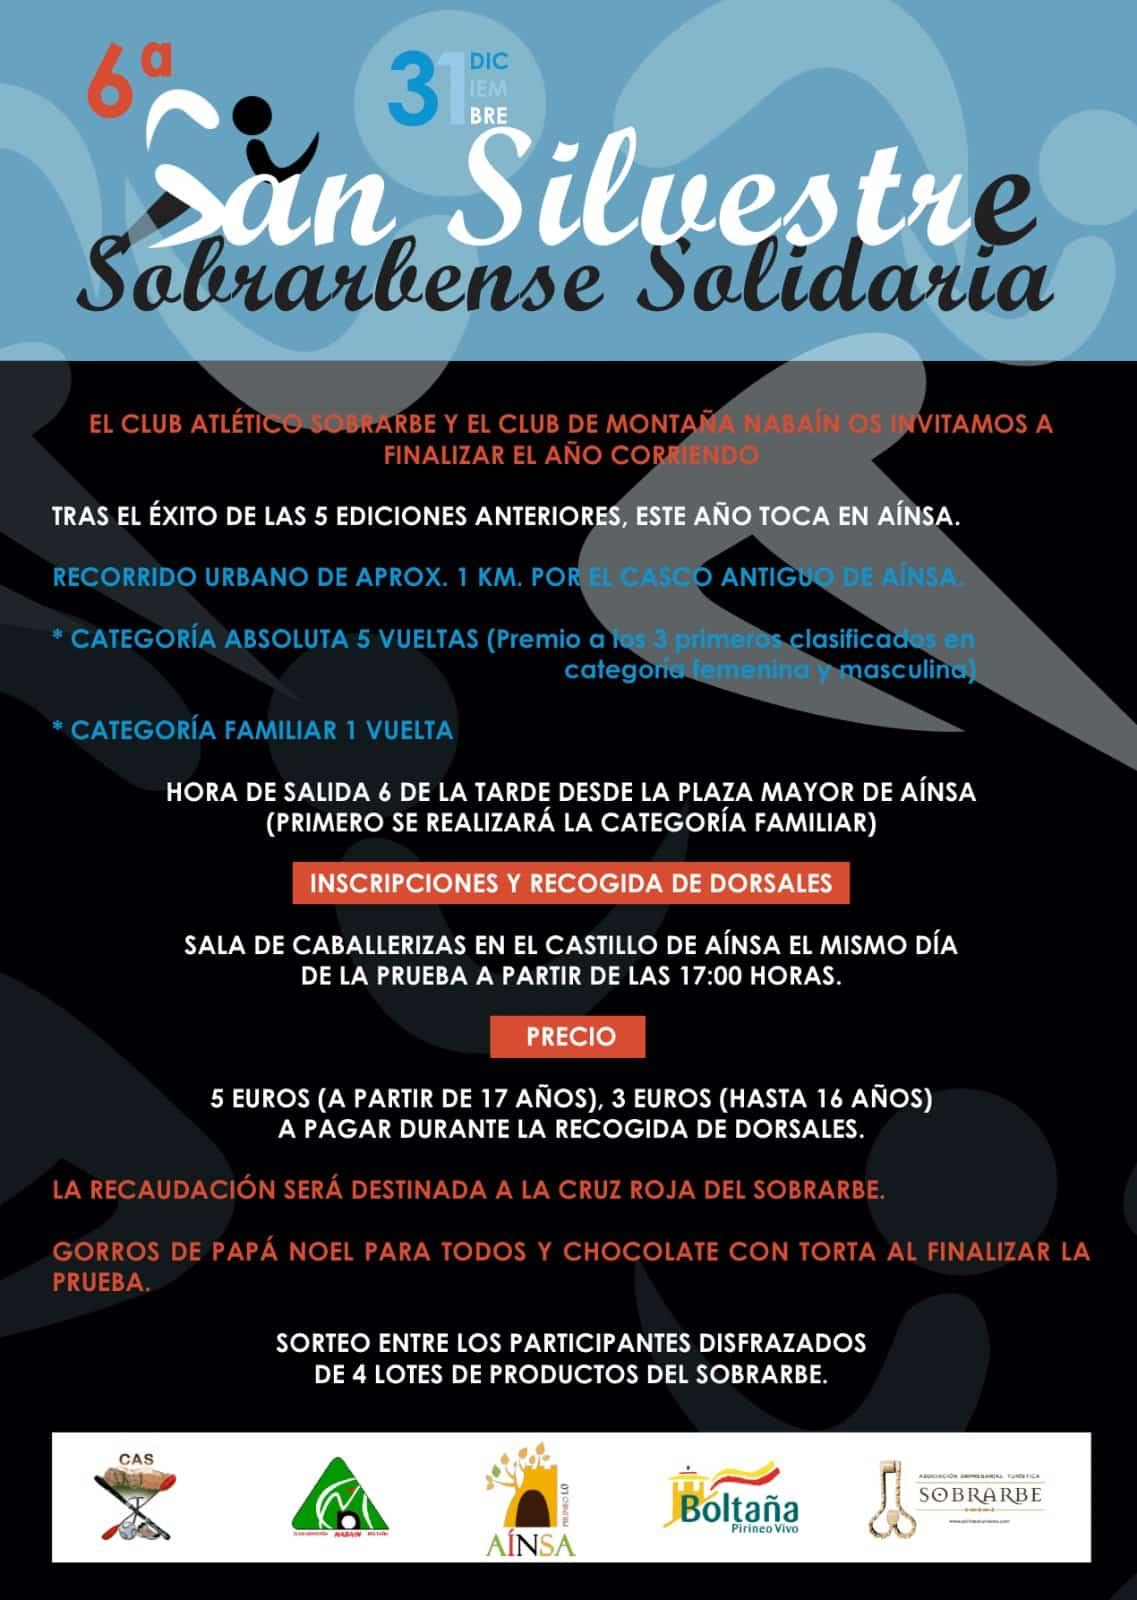 6ªSAN SILVESTRE SOBRARBENSE SOLIDARIA - Aínsa Sobrarbe